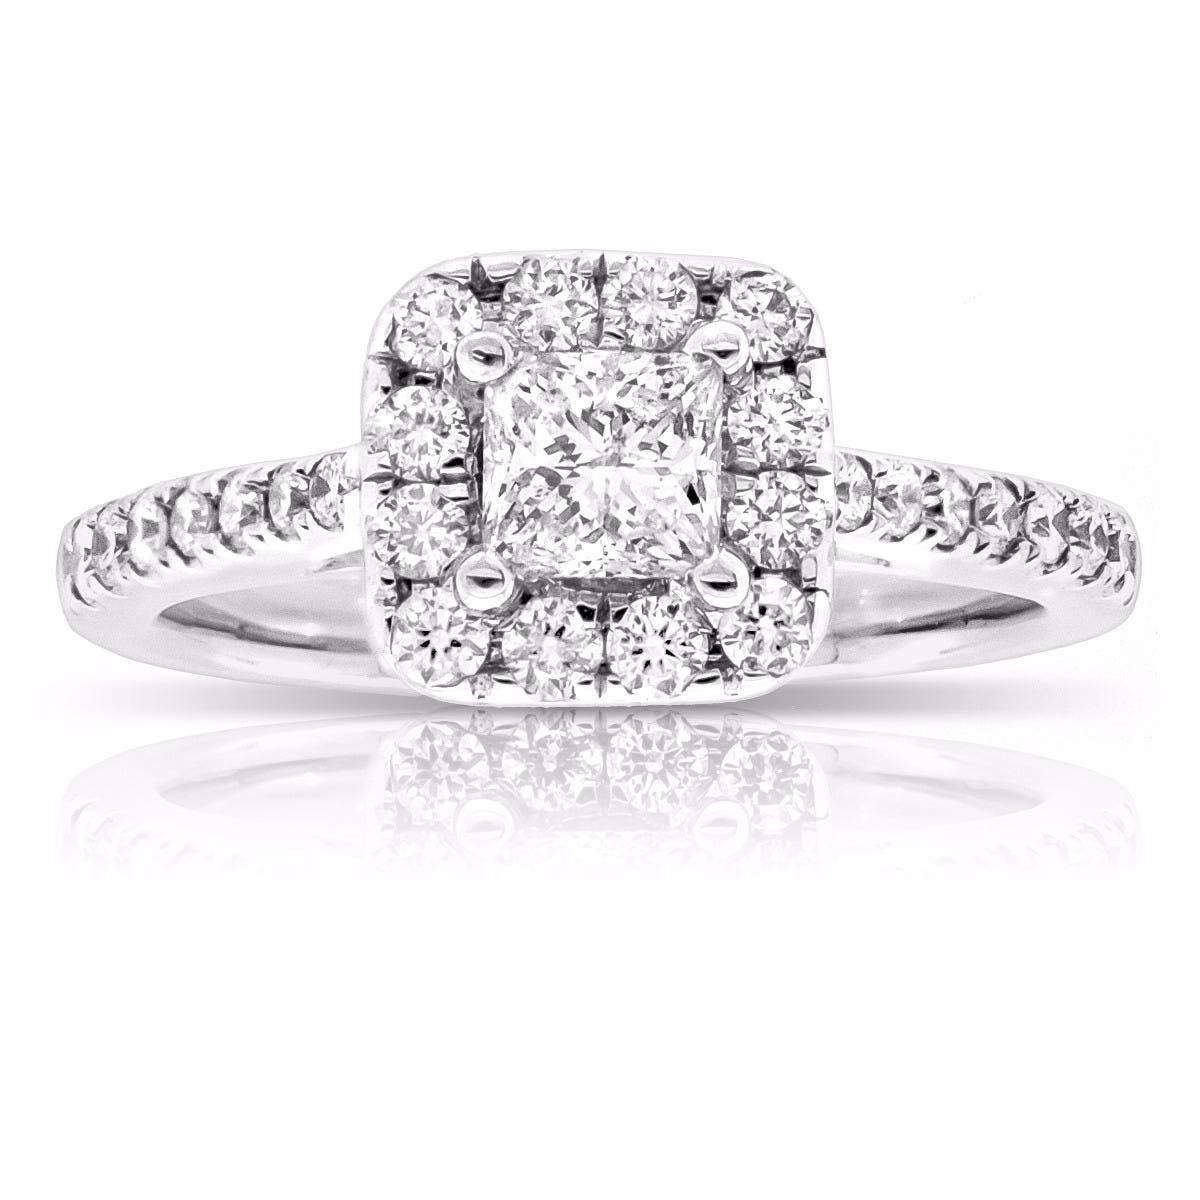 Lily. Princess-Cut Pavé Diamond Engagement Ring 14k White Gold